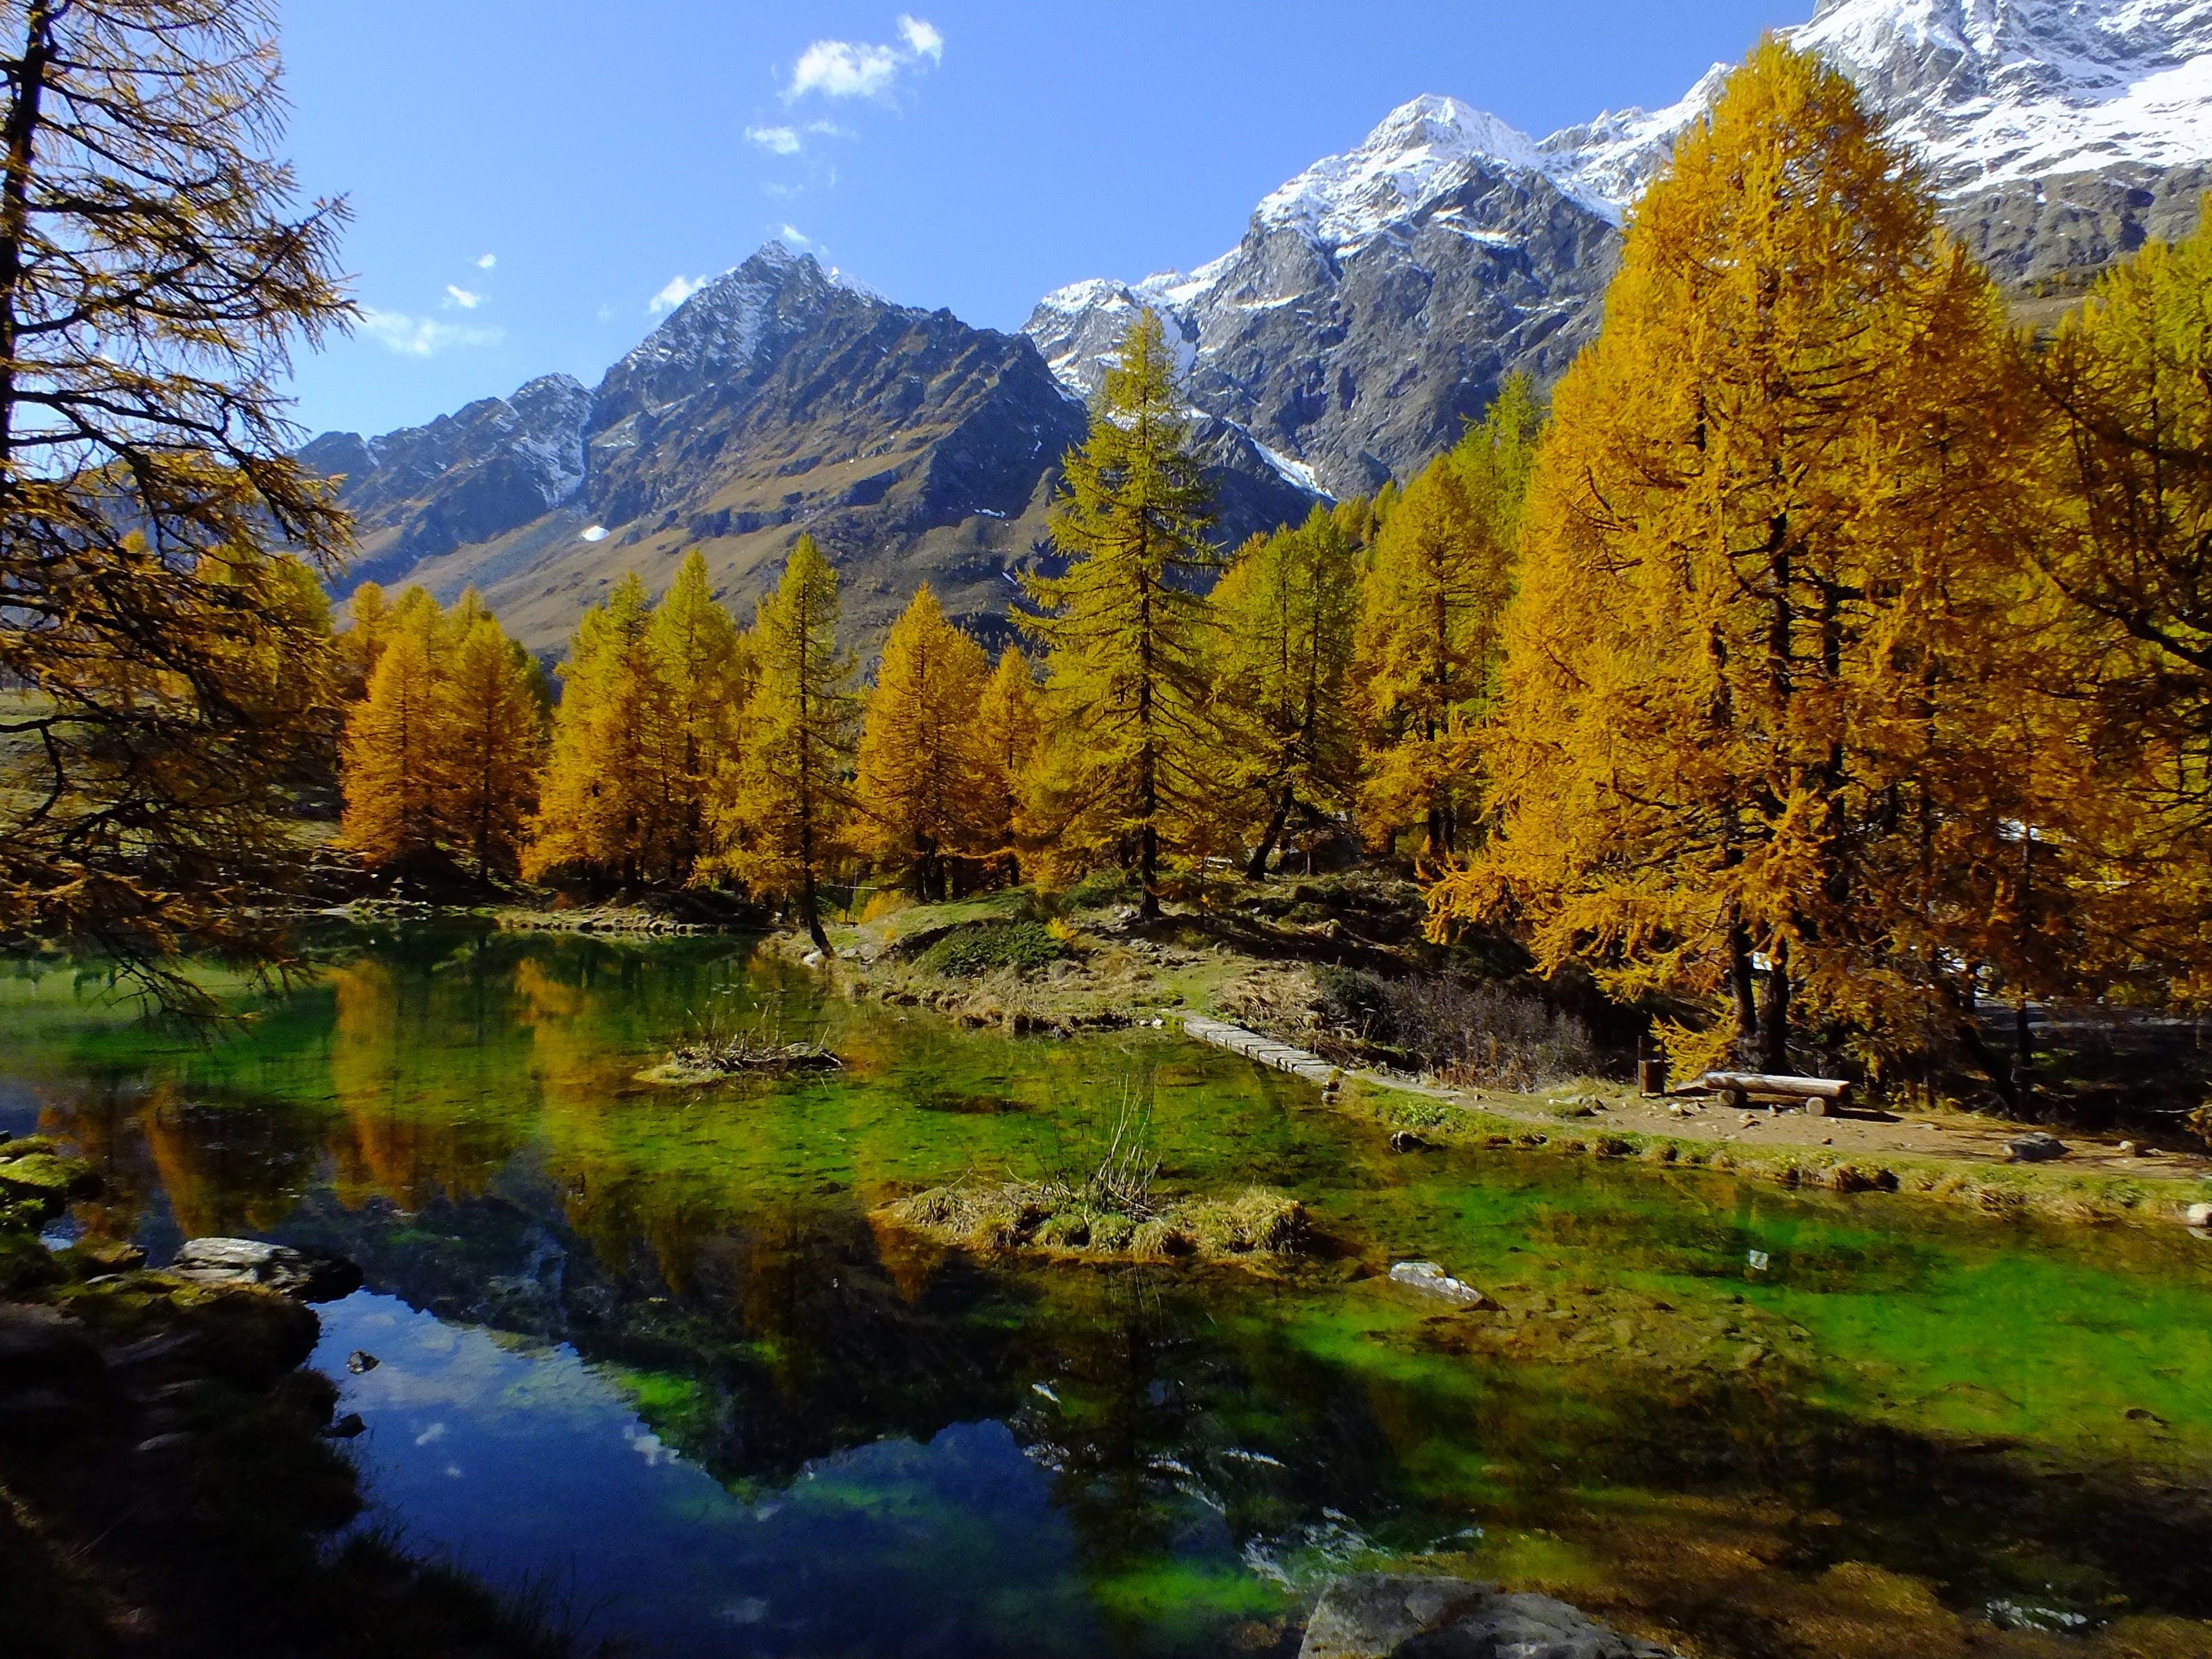 Trees Near the Mountains